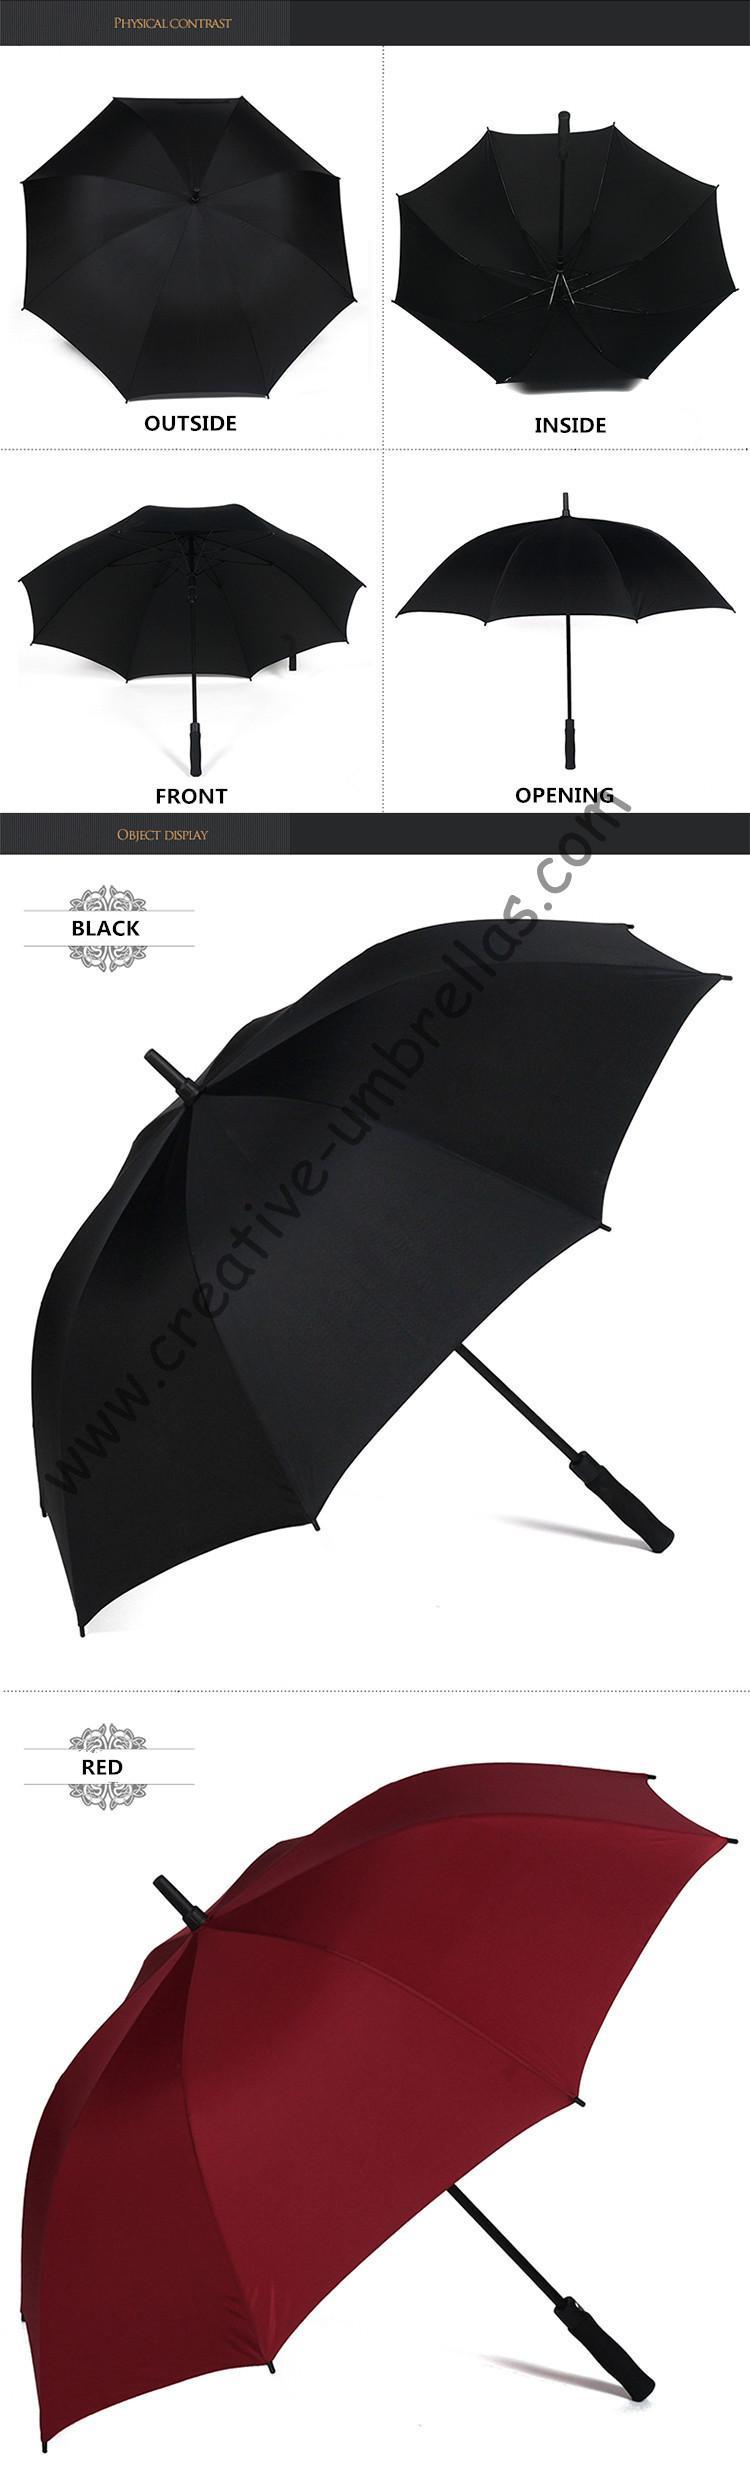 Straight golf umbrellas.14mm fiberglass shaft and ribs,auto open,windproof,anti-thunderbolt golf,anti satic,anti electricity   #GolfAccessories #GolfCart #GolfRangeFinder